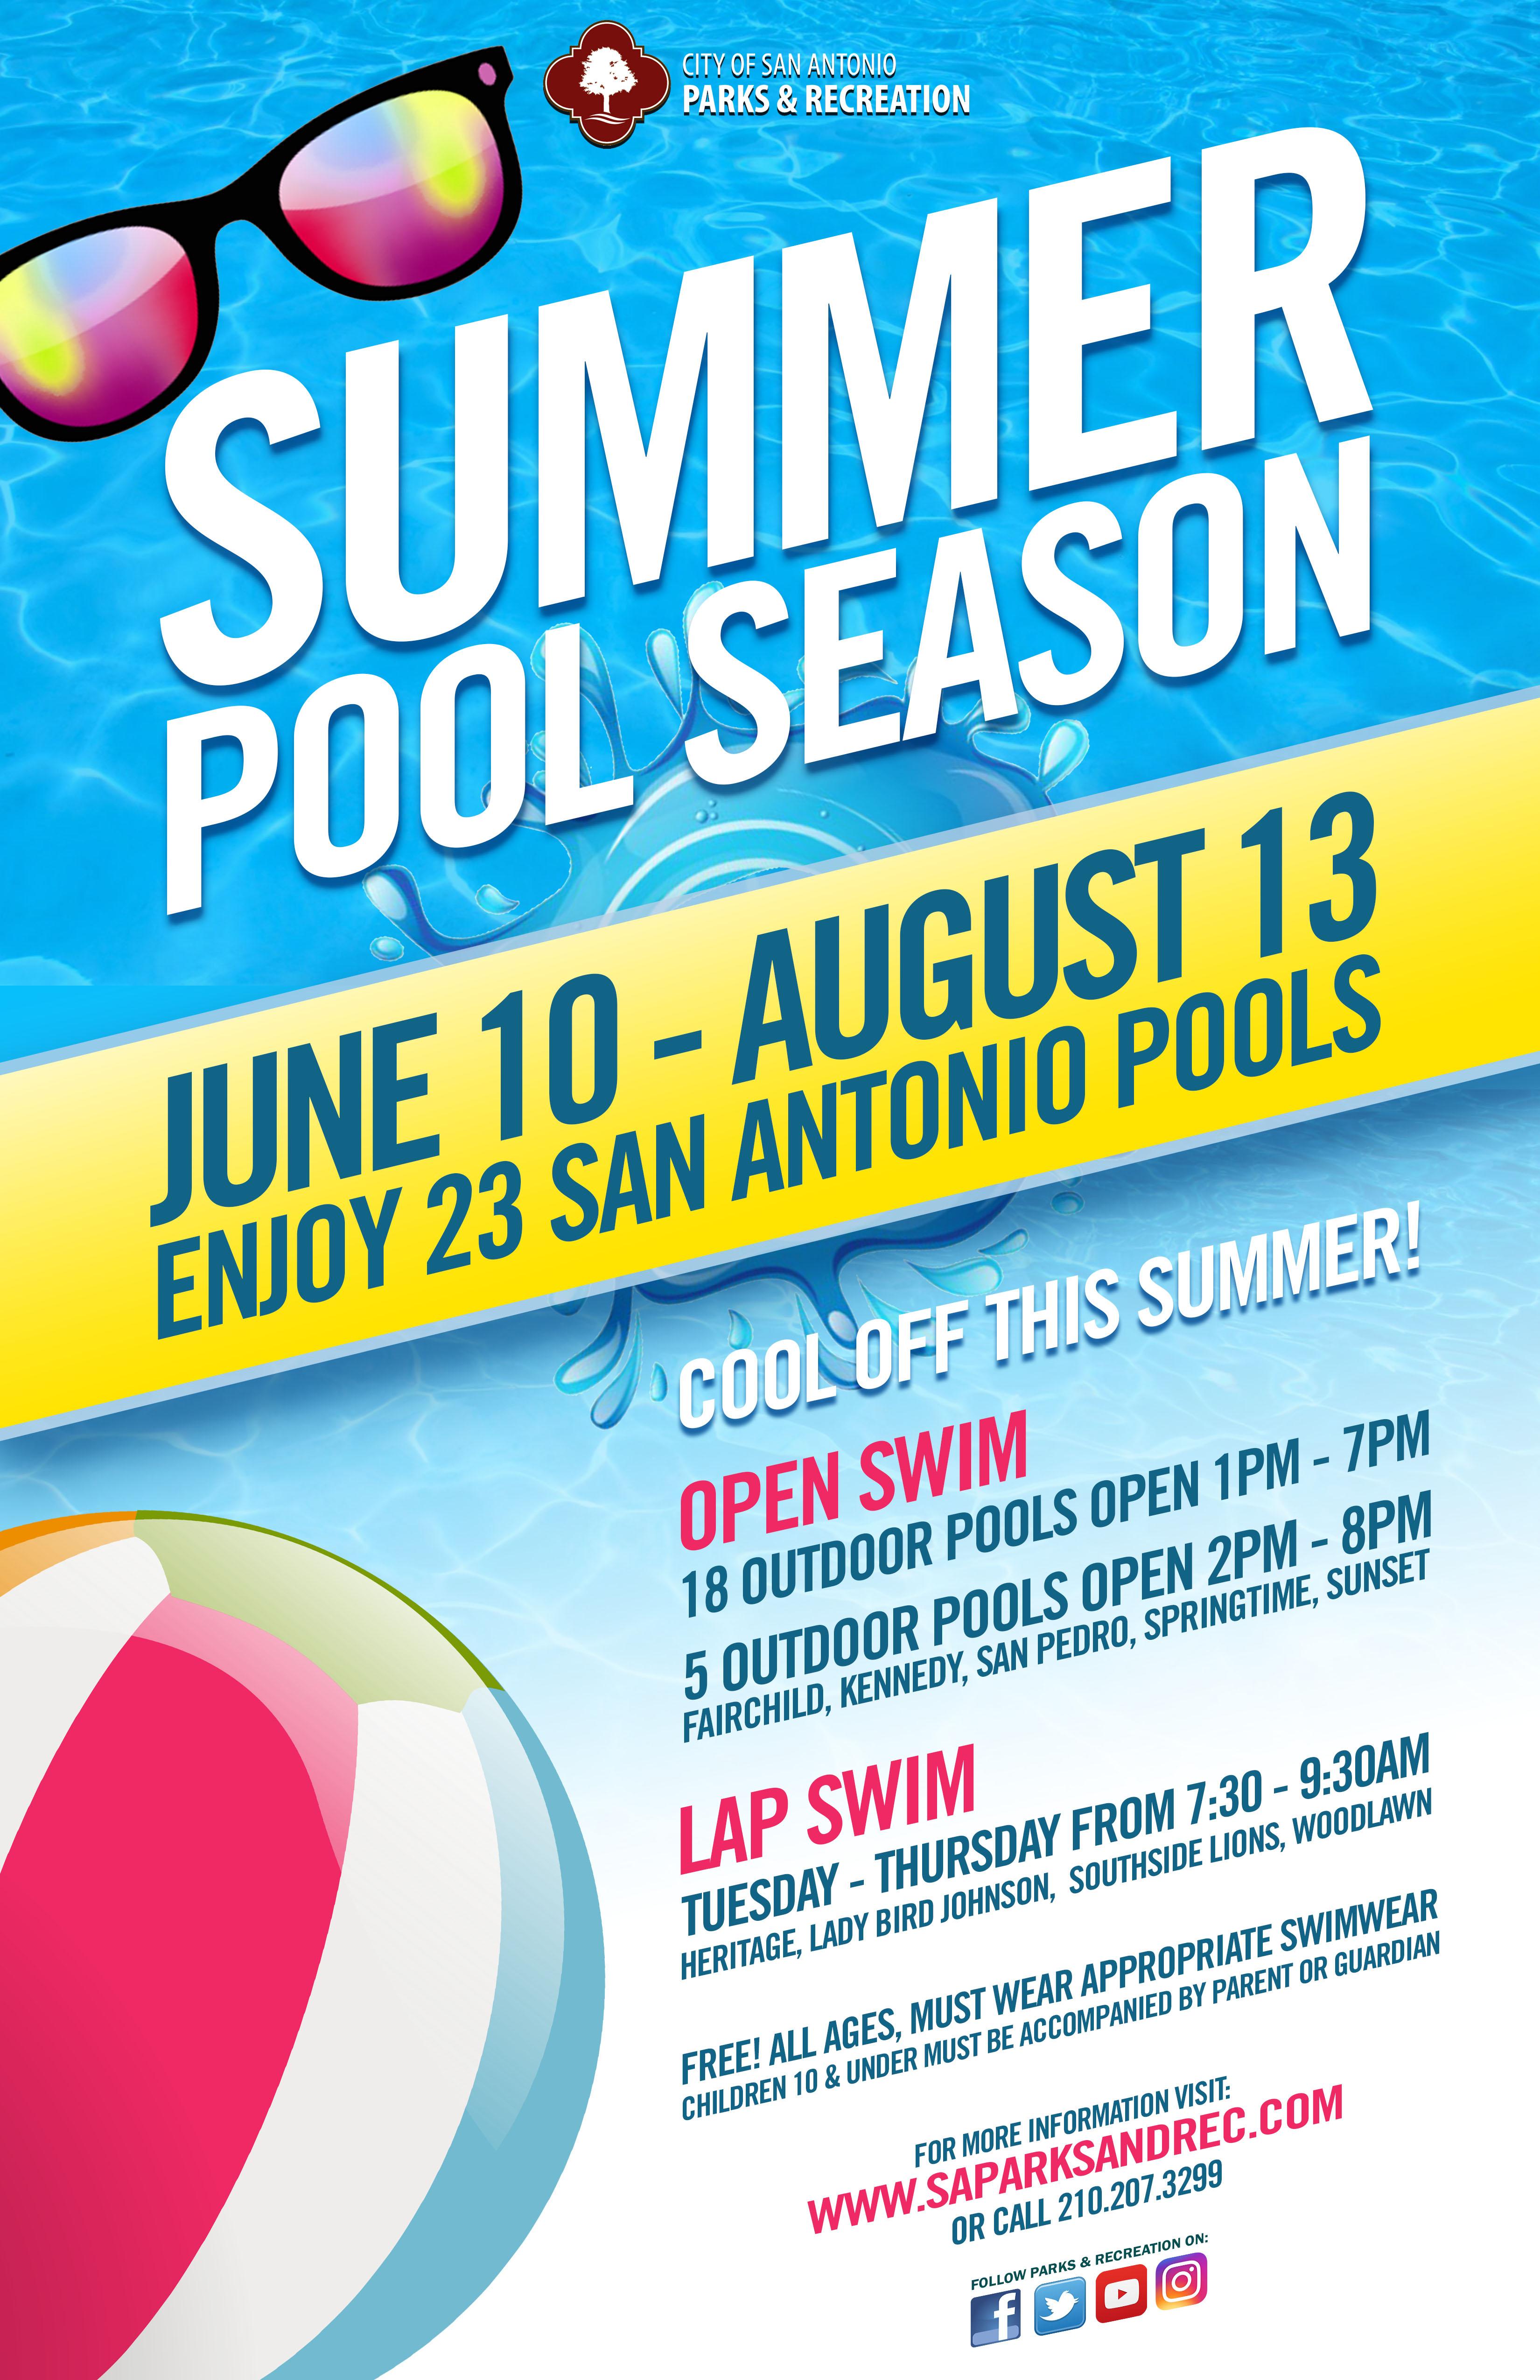 Summer Pool Season Open - The City of San Antonio - Official City ...